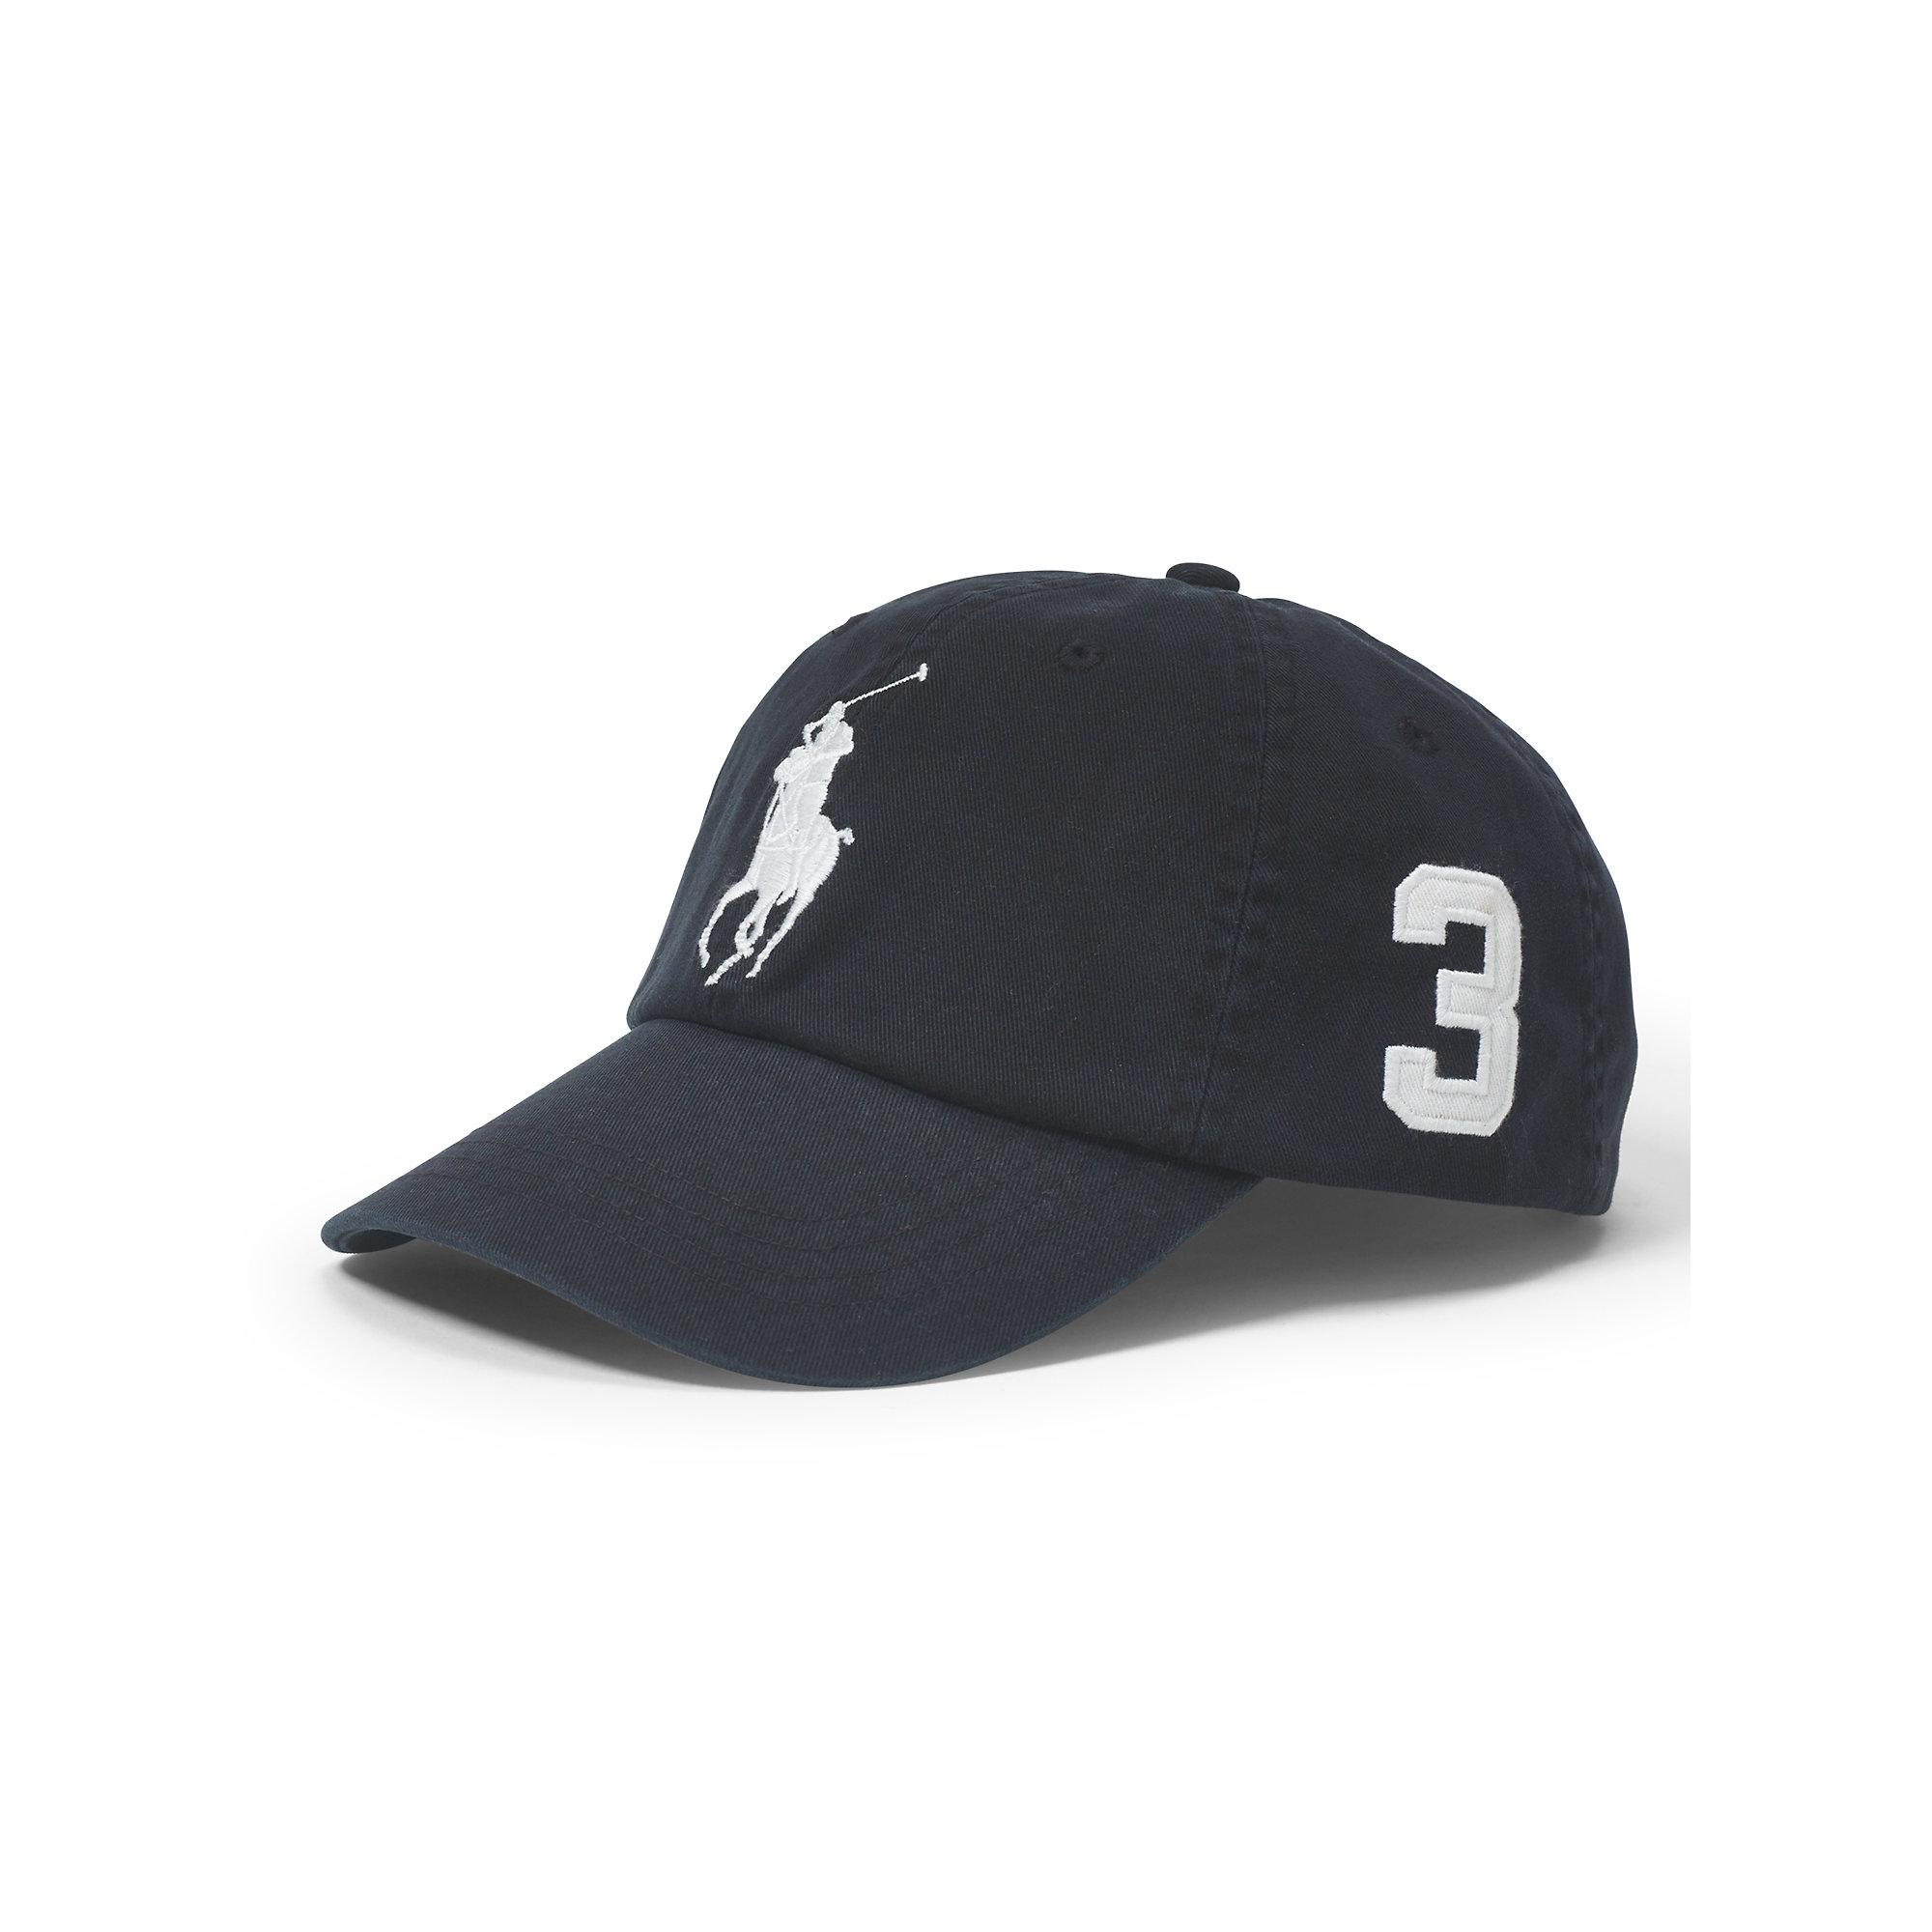 1346b8e2dc8 Lyst - Polo Ralph Lauren Big Pony Chino Baseball Cap in Black for Men